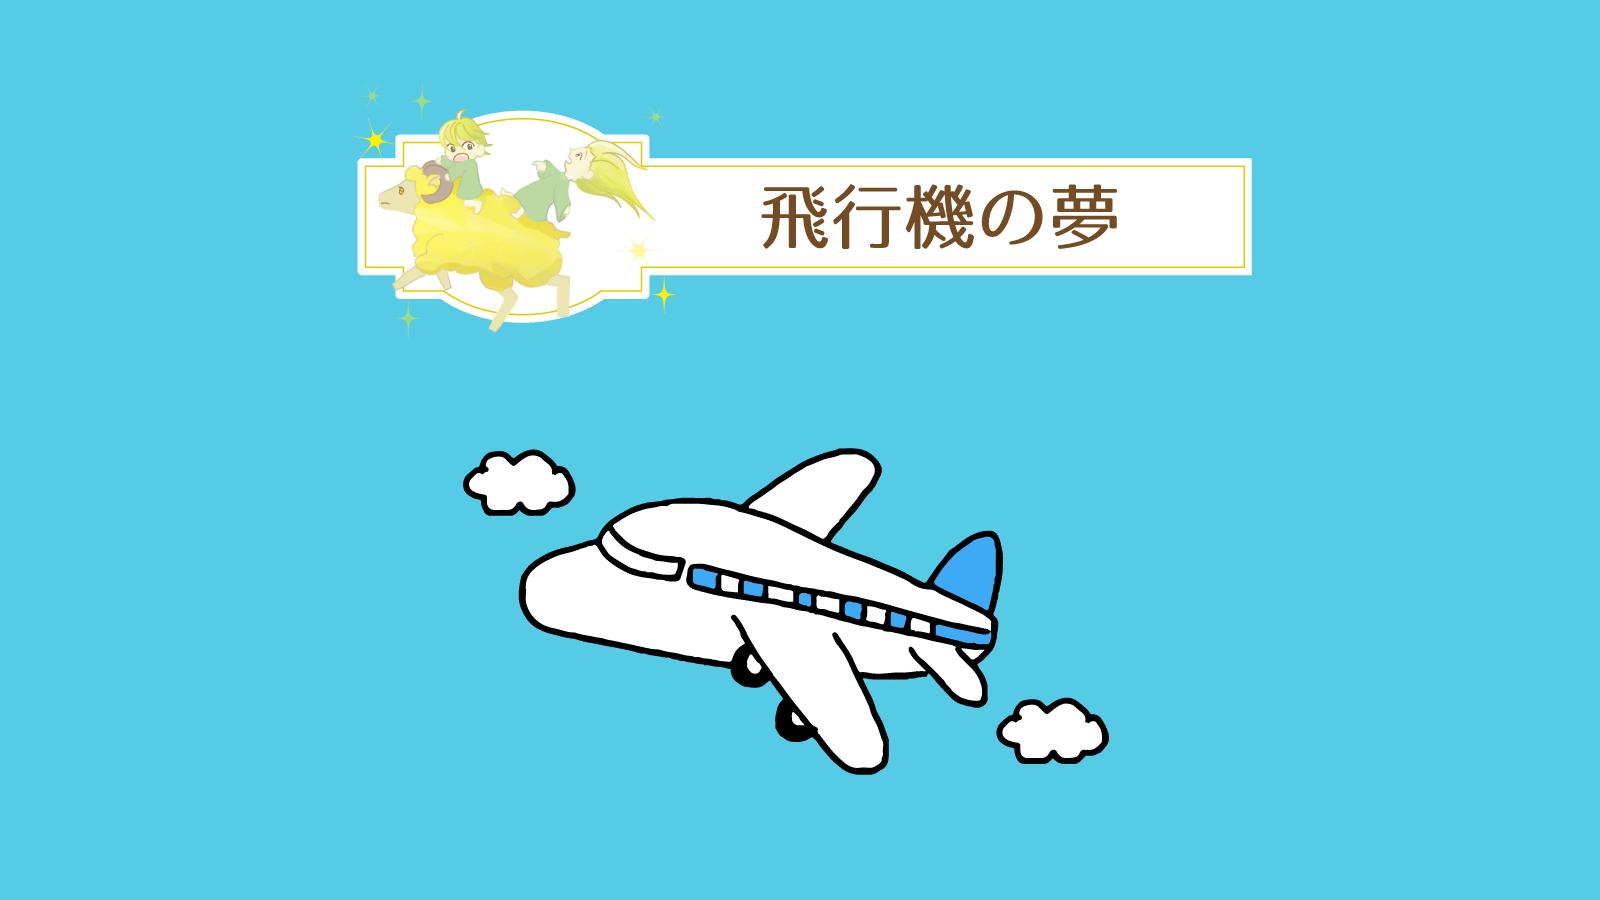 飛行機 夢 墜落 占い